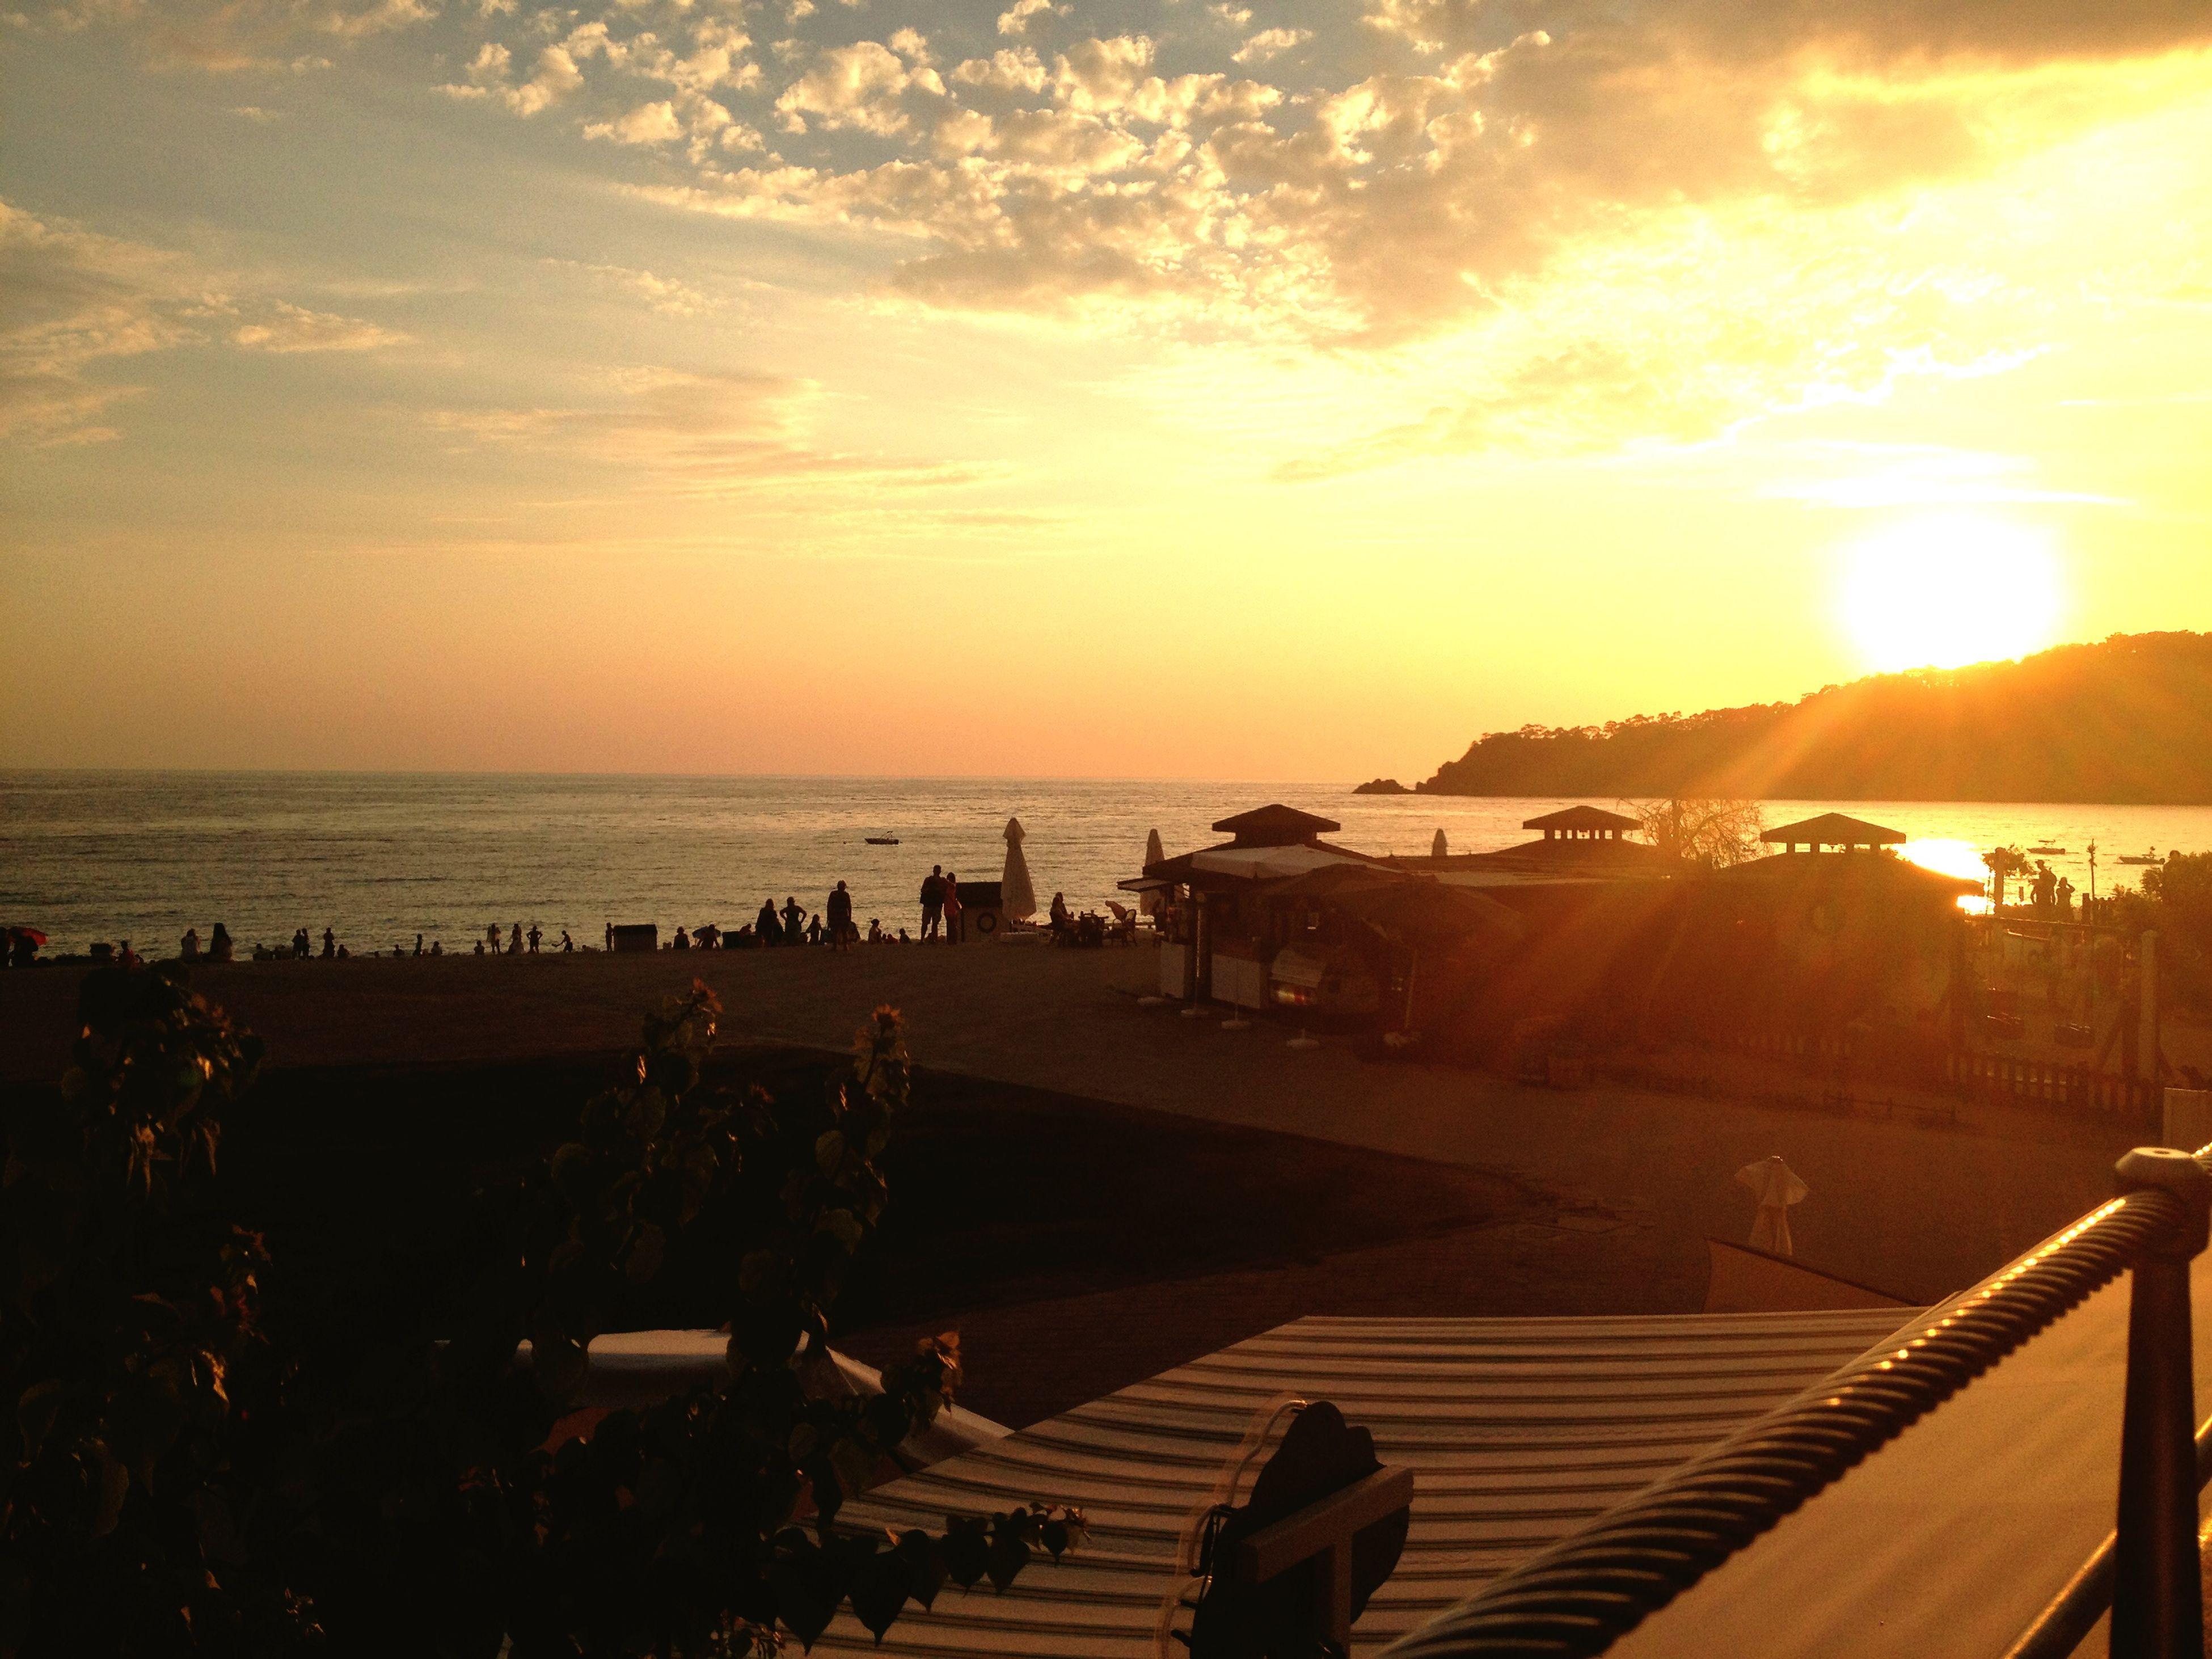 sea, water, sunset, horizon over water, beach, sun, sky, scenics, sunlight, beauty in nature, tranquil scene, shore, tranquility, nature, the way forward, incidental people, sand, idyllic, railing, pier